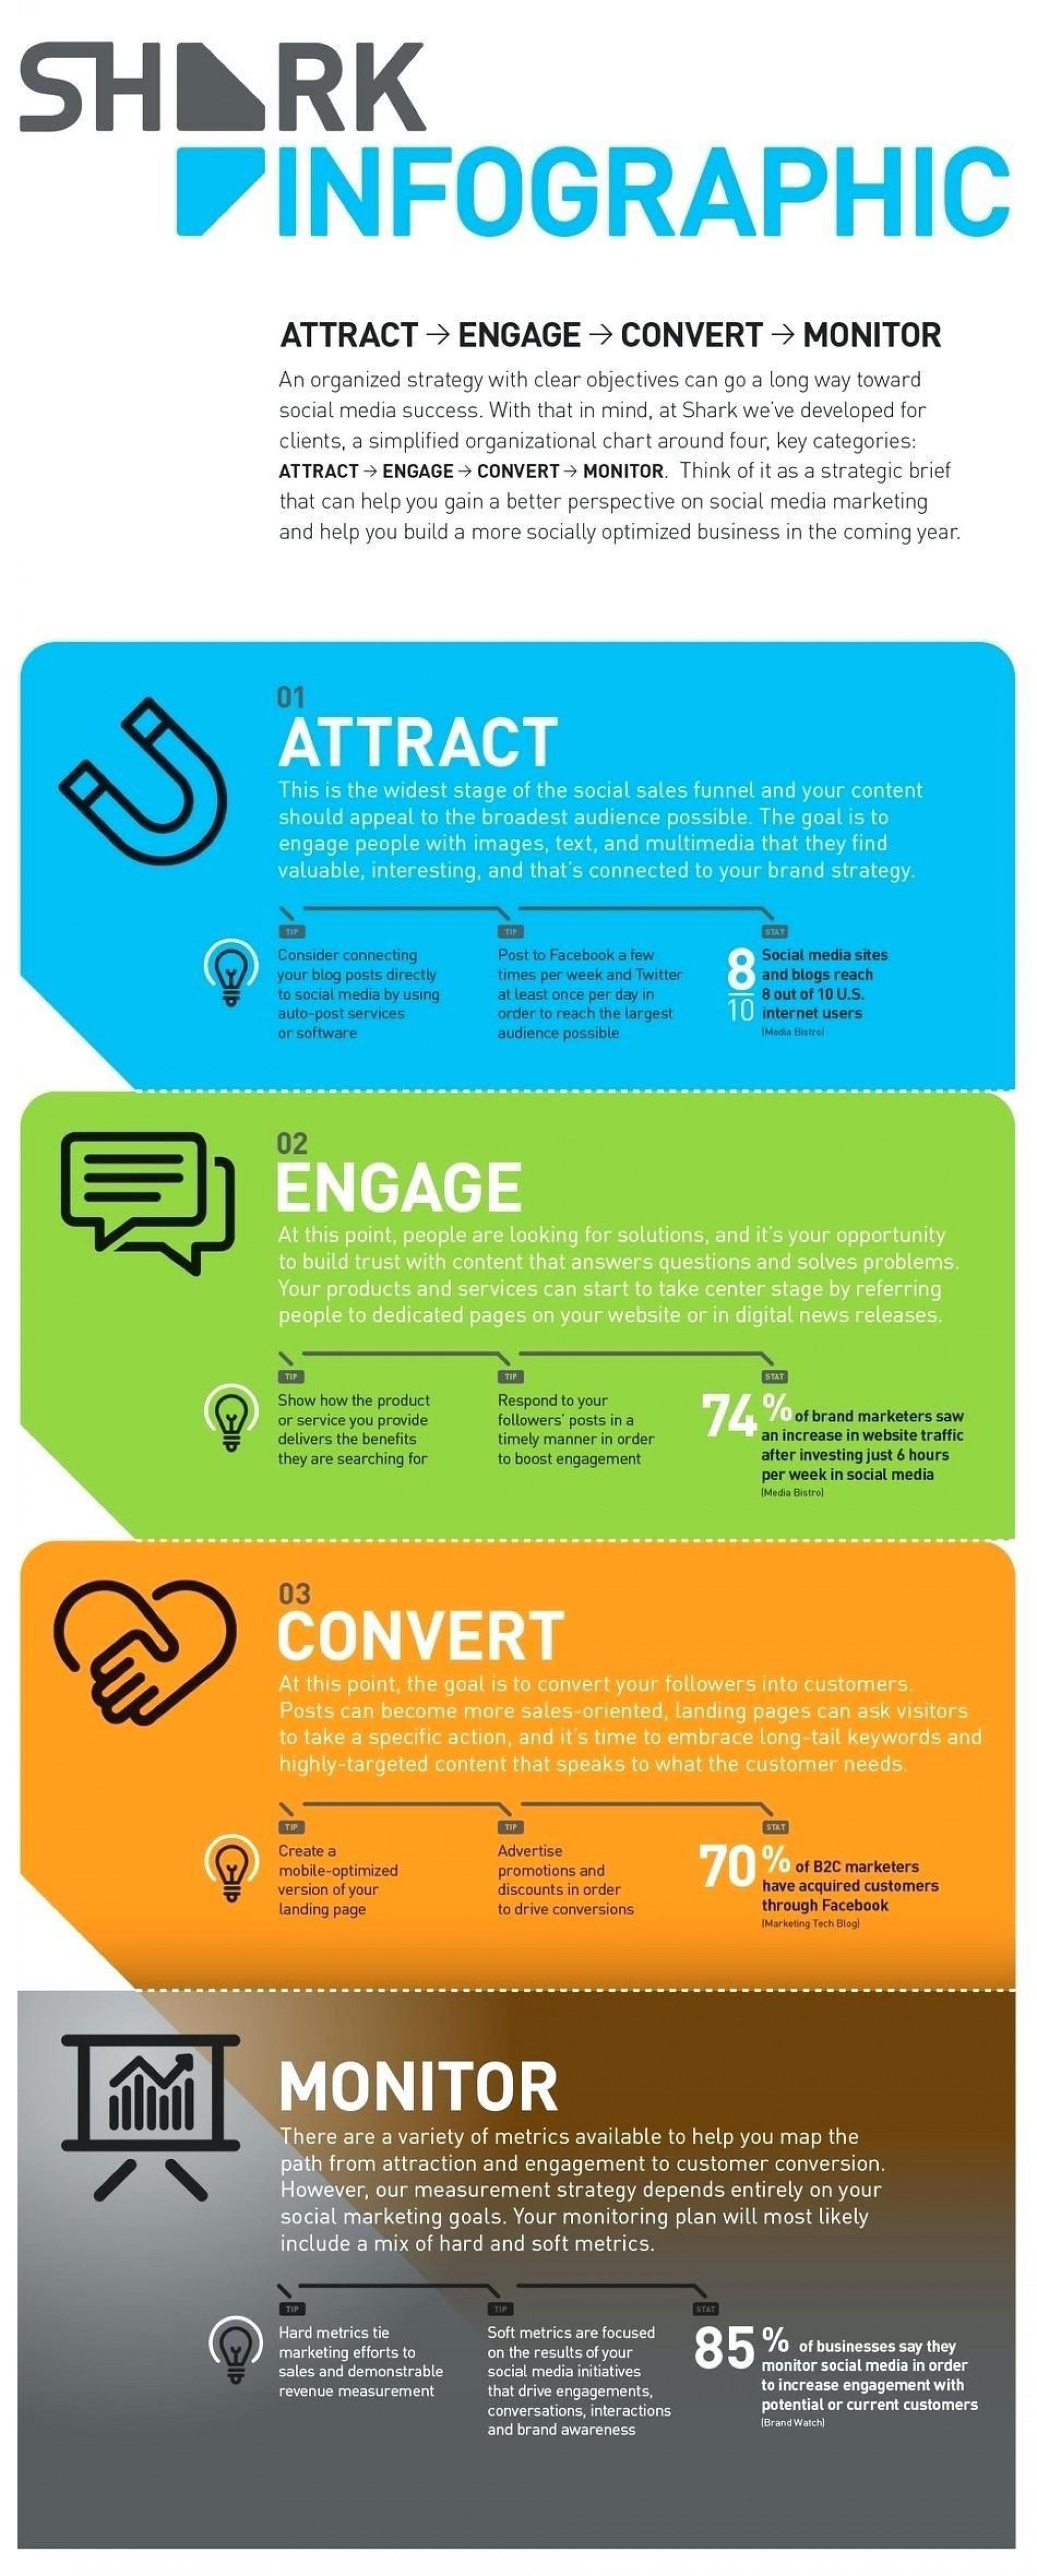 002 Striking Digital Marketing Busines Plan Sample High Definition  Template1920